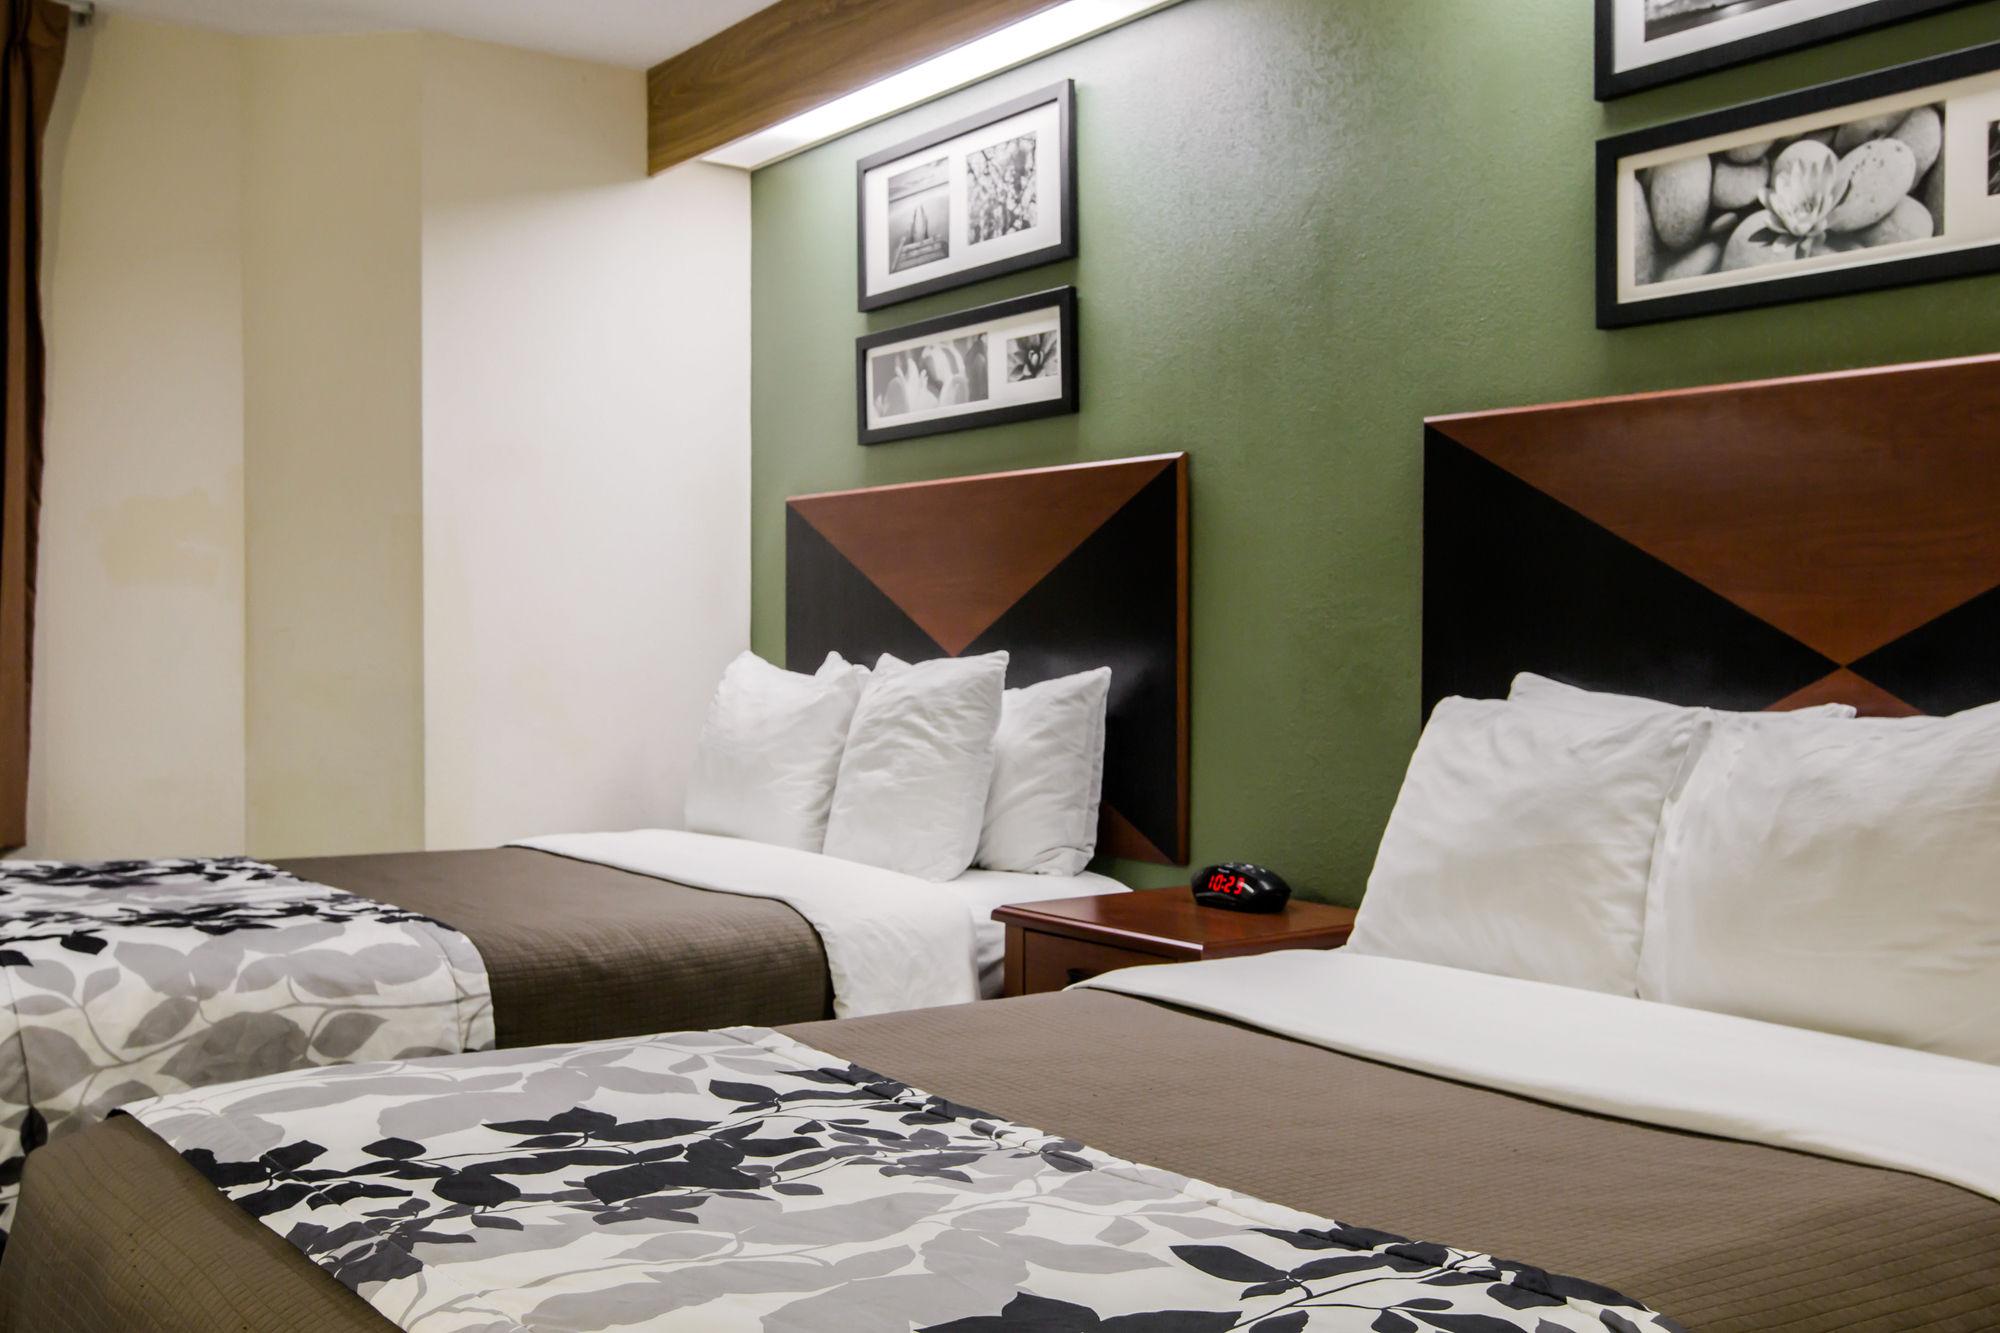 Sleep Inn & Suites in Chattanooga, TN